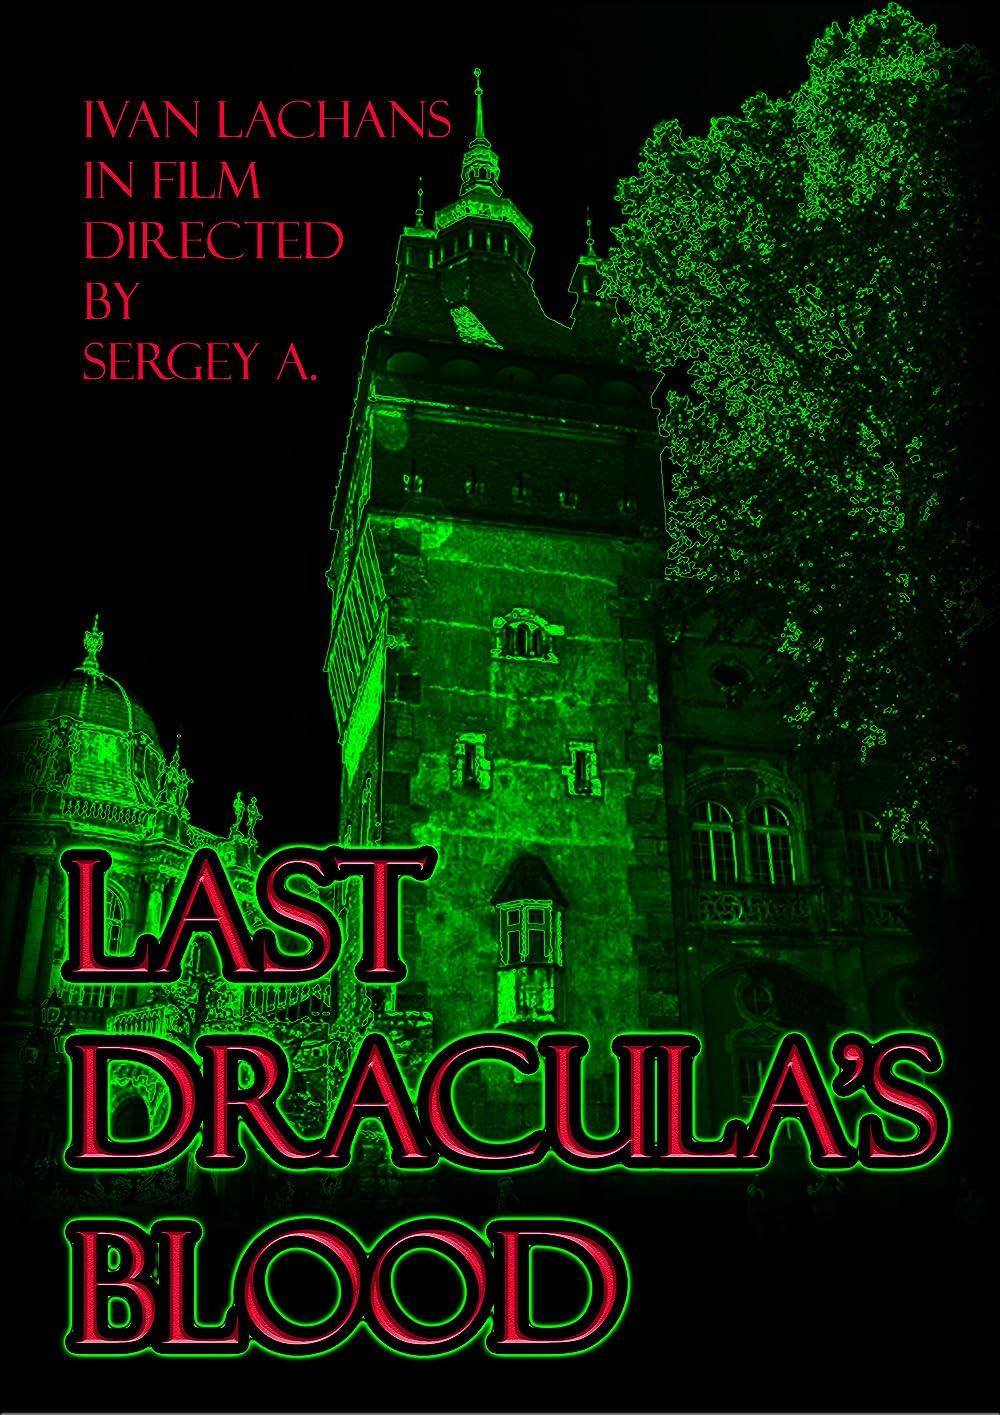 Last Dracula's blood 2018